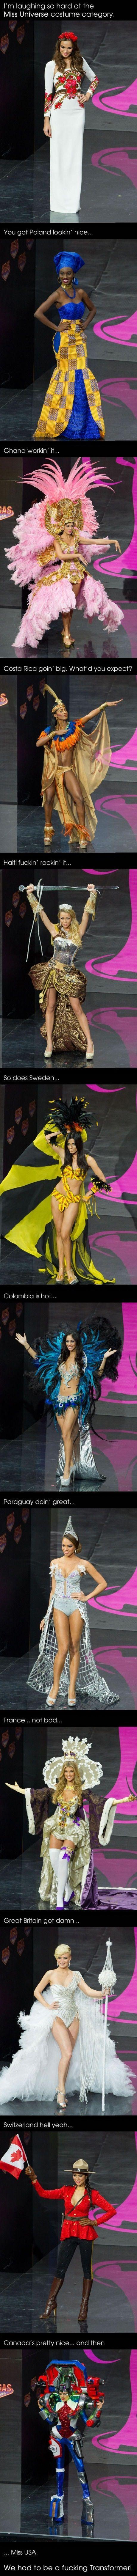 Miss Universe Costume Category...Enjoy !